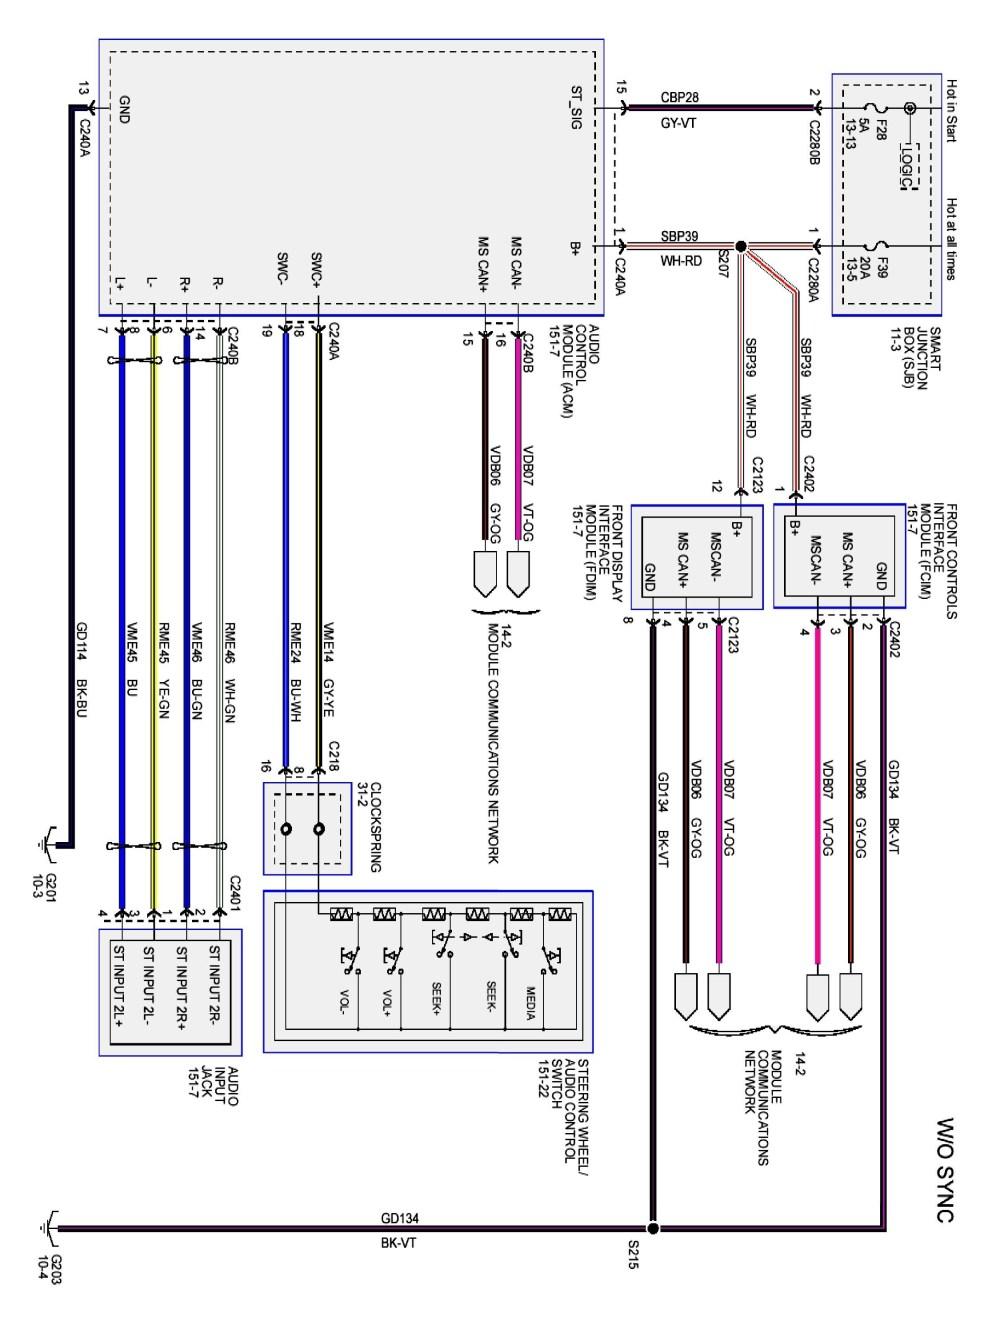 medium resolution of ford 6000 starter wiring diagram wiring diagram centre ford 6000 starter wiring diagram